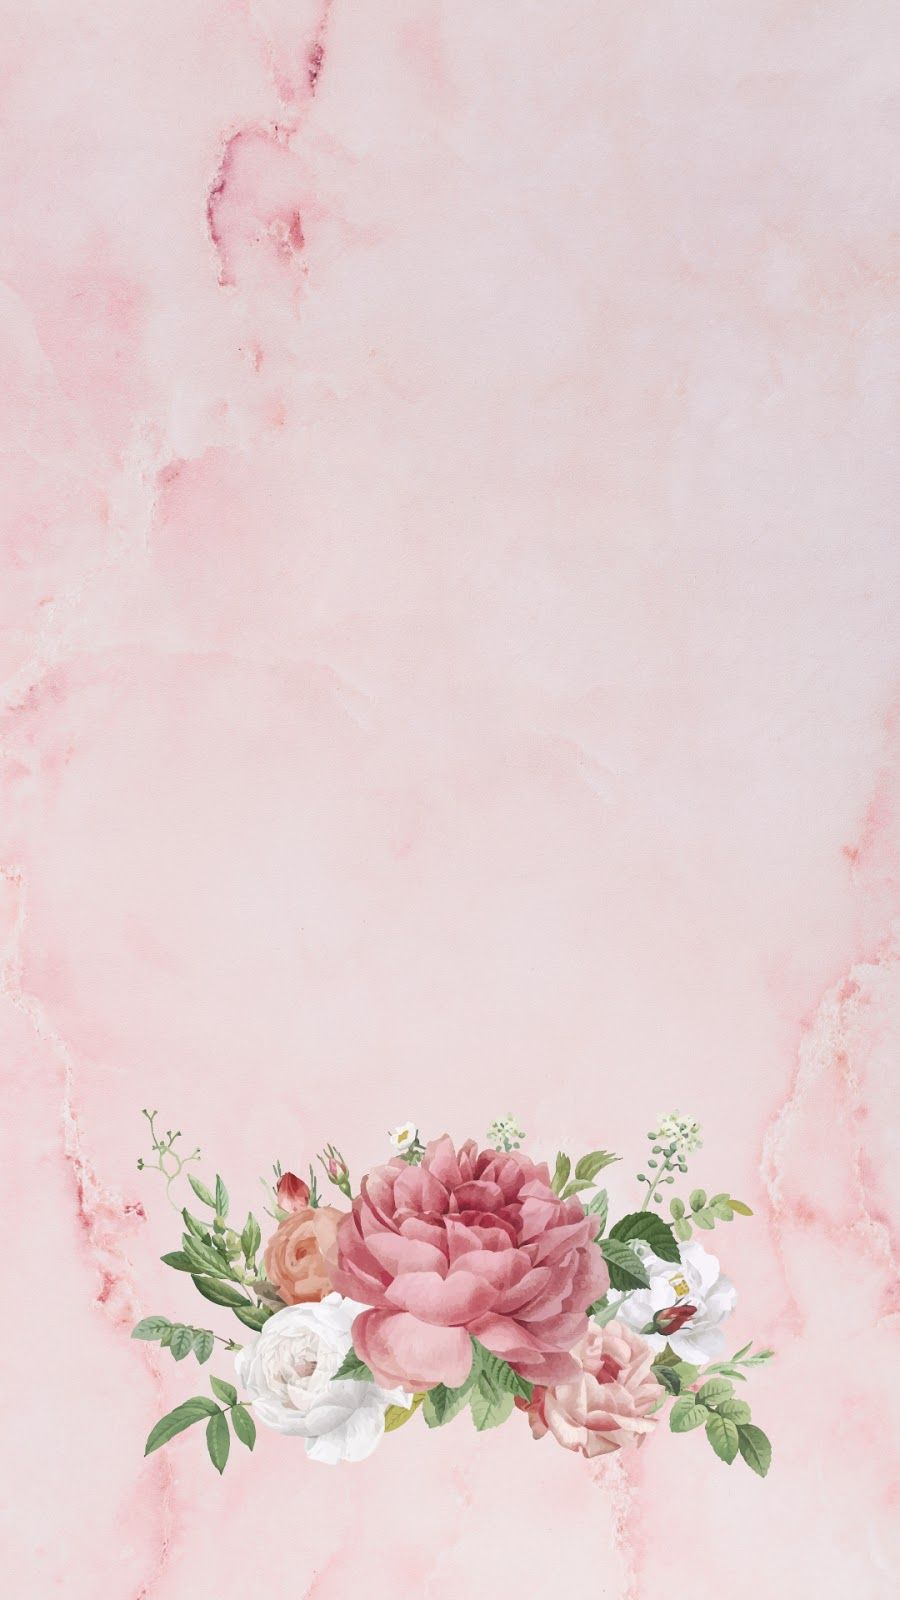 20 Latest Iphone Wallpaper And Background Molduras Para